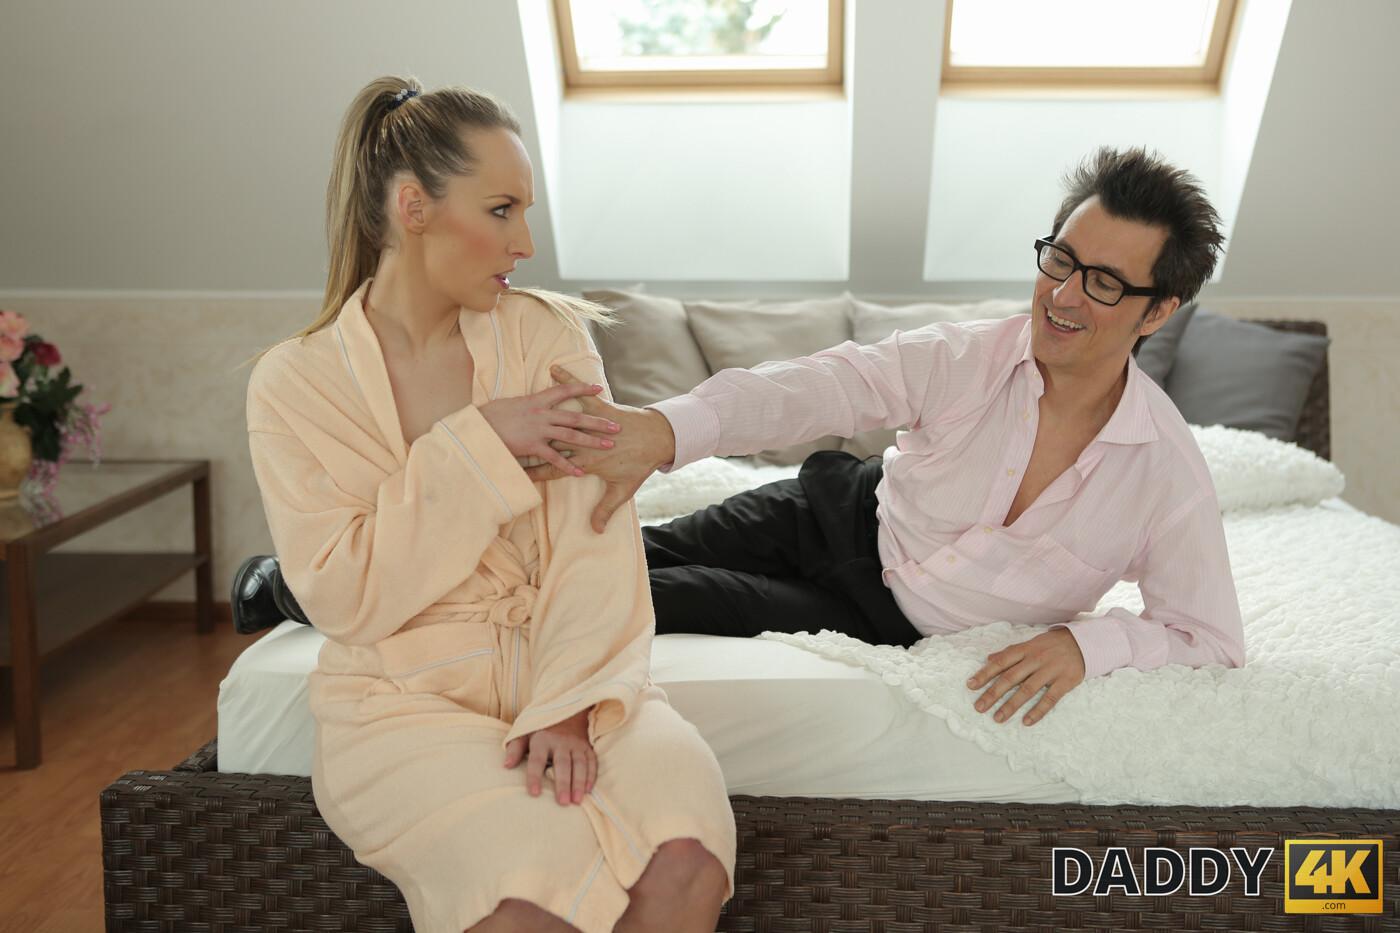 DADDY4K. Dazzling minx has an affair with boyfriends dad in the bed